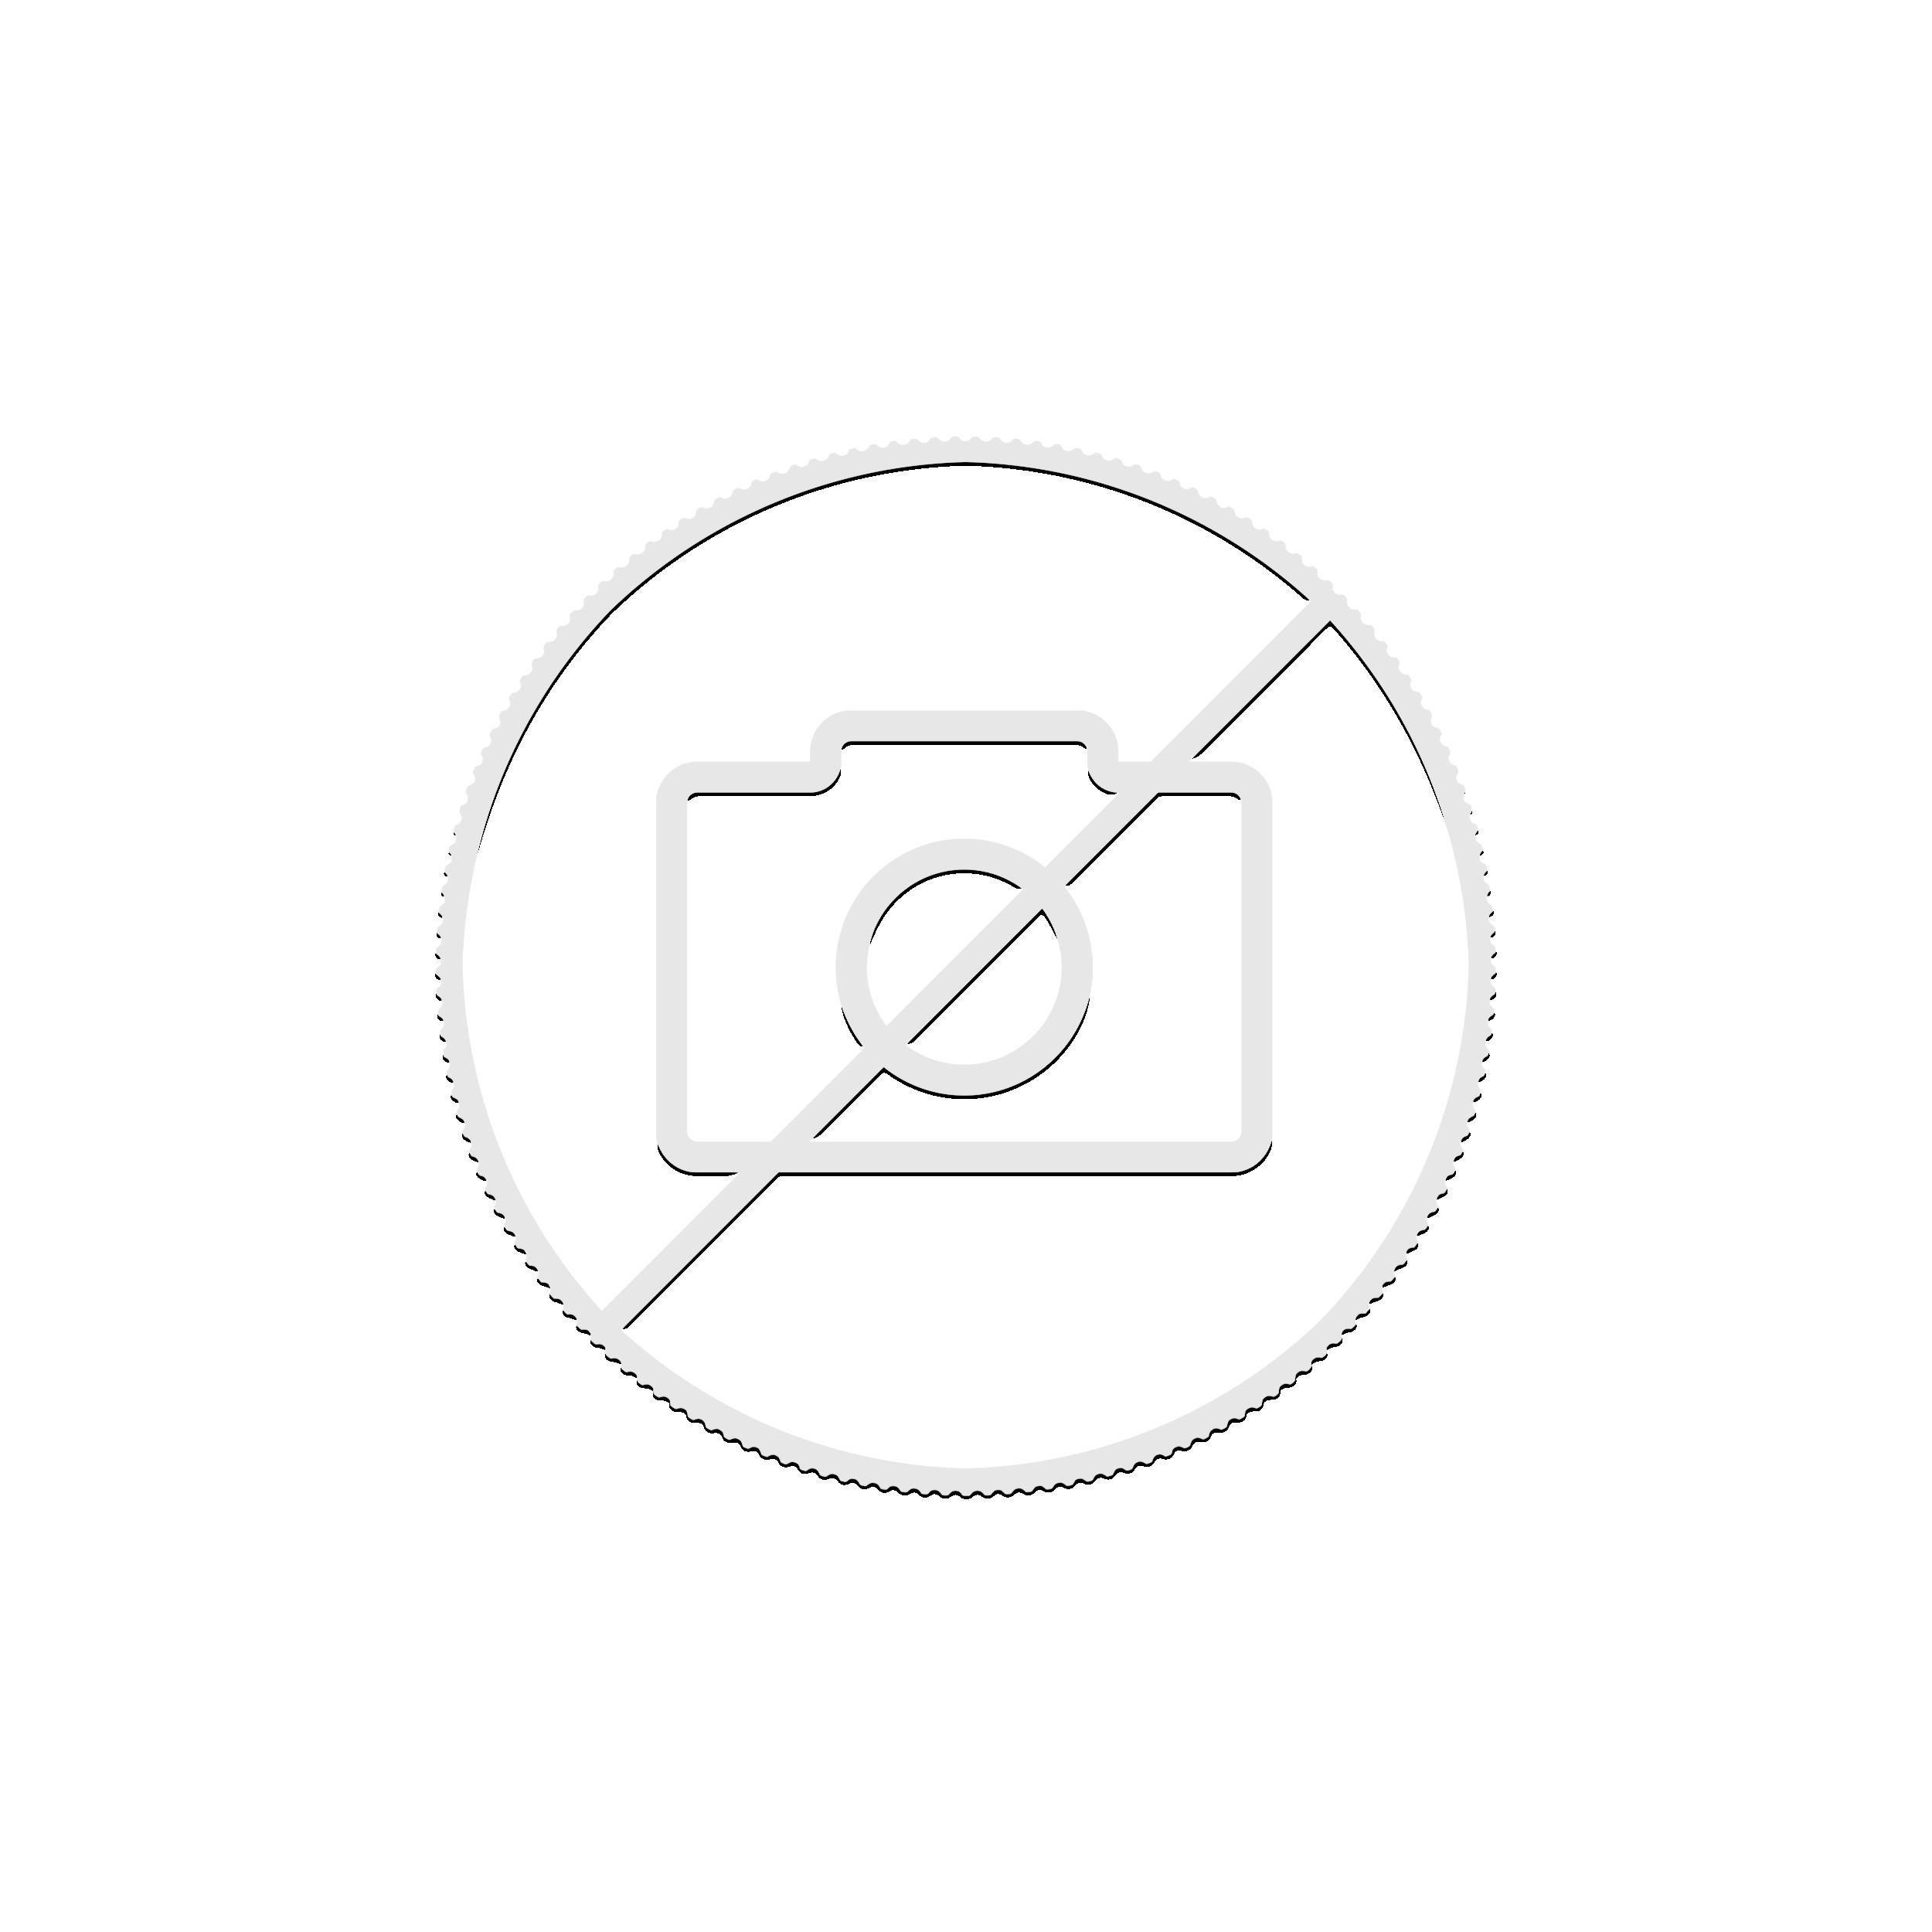 Gouden Tientje Circulated conditie